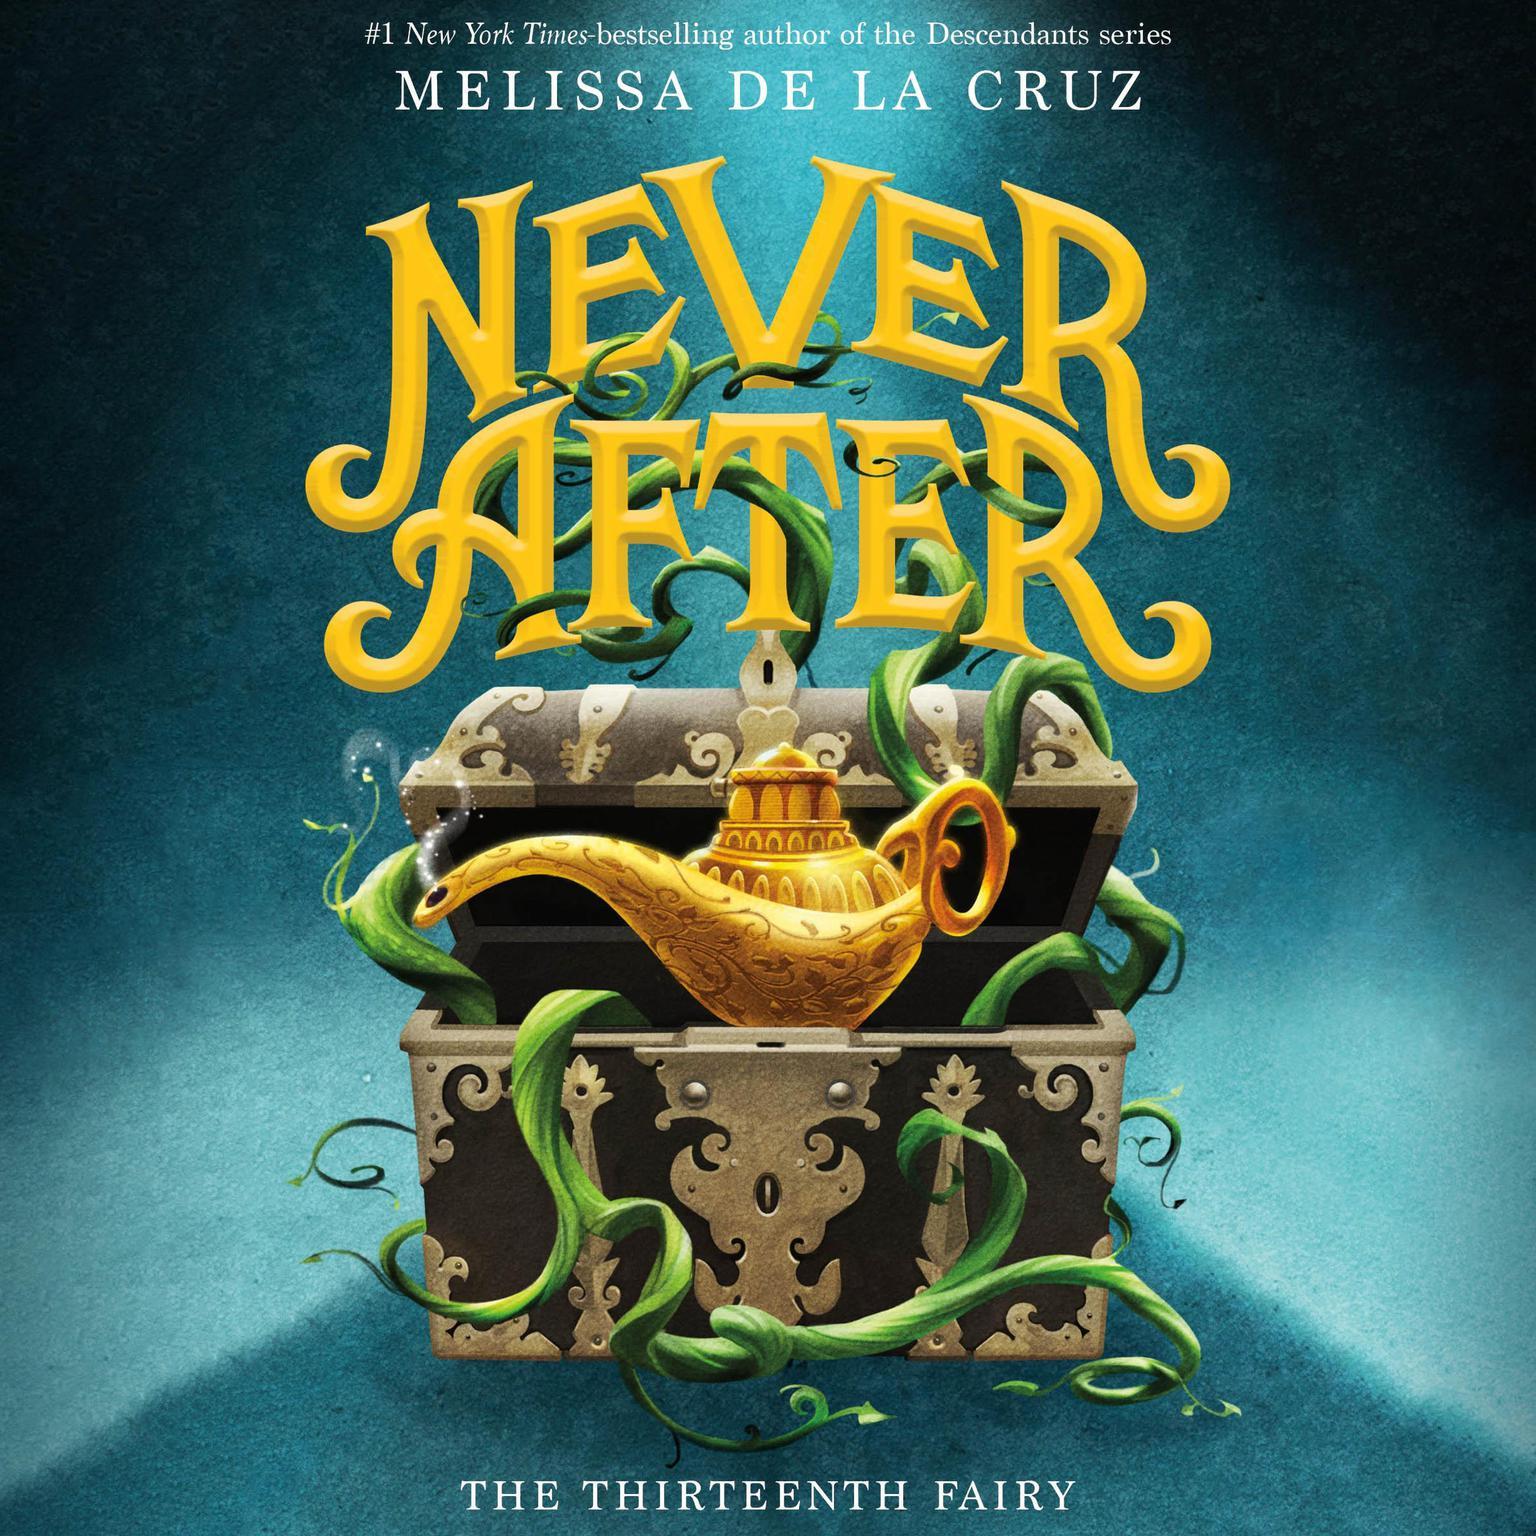 Never After: The Thirteenth Fairy Audiobook, by Melissa de la Cruz